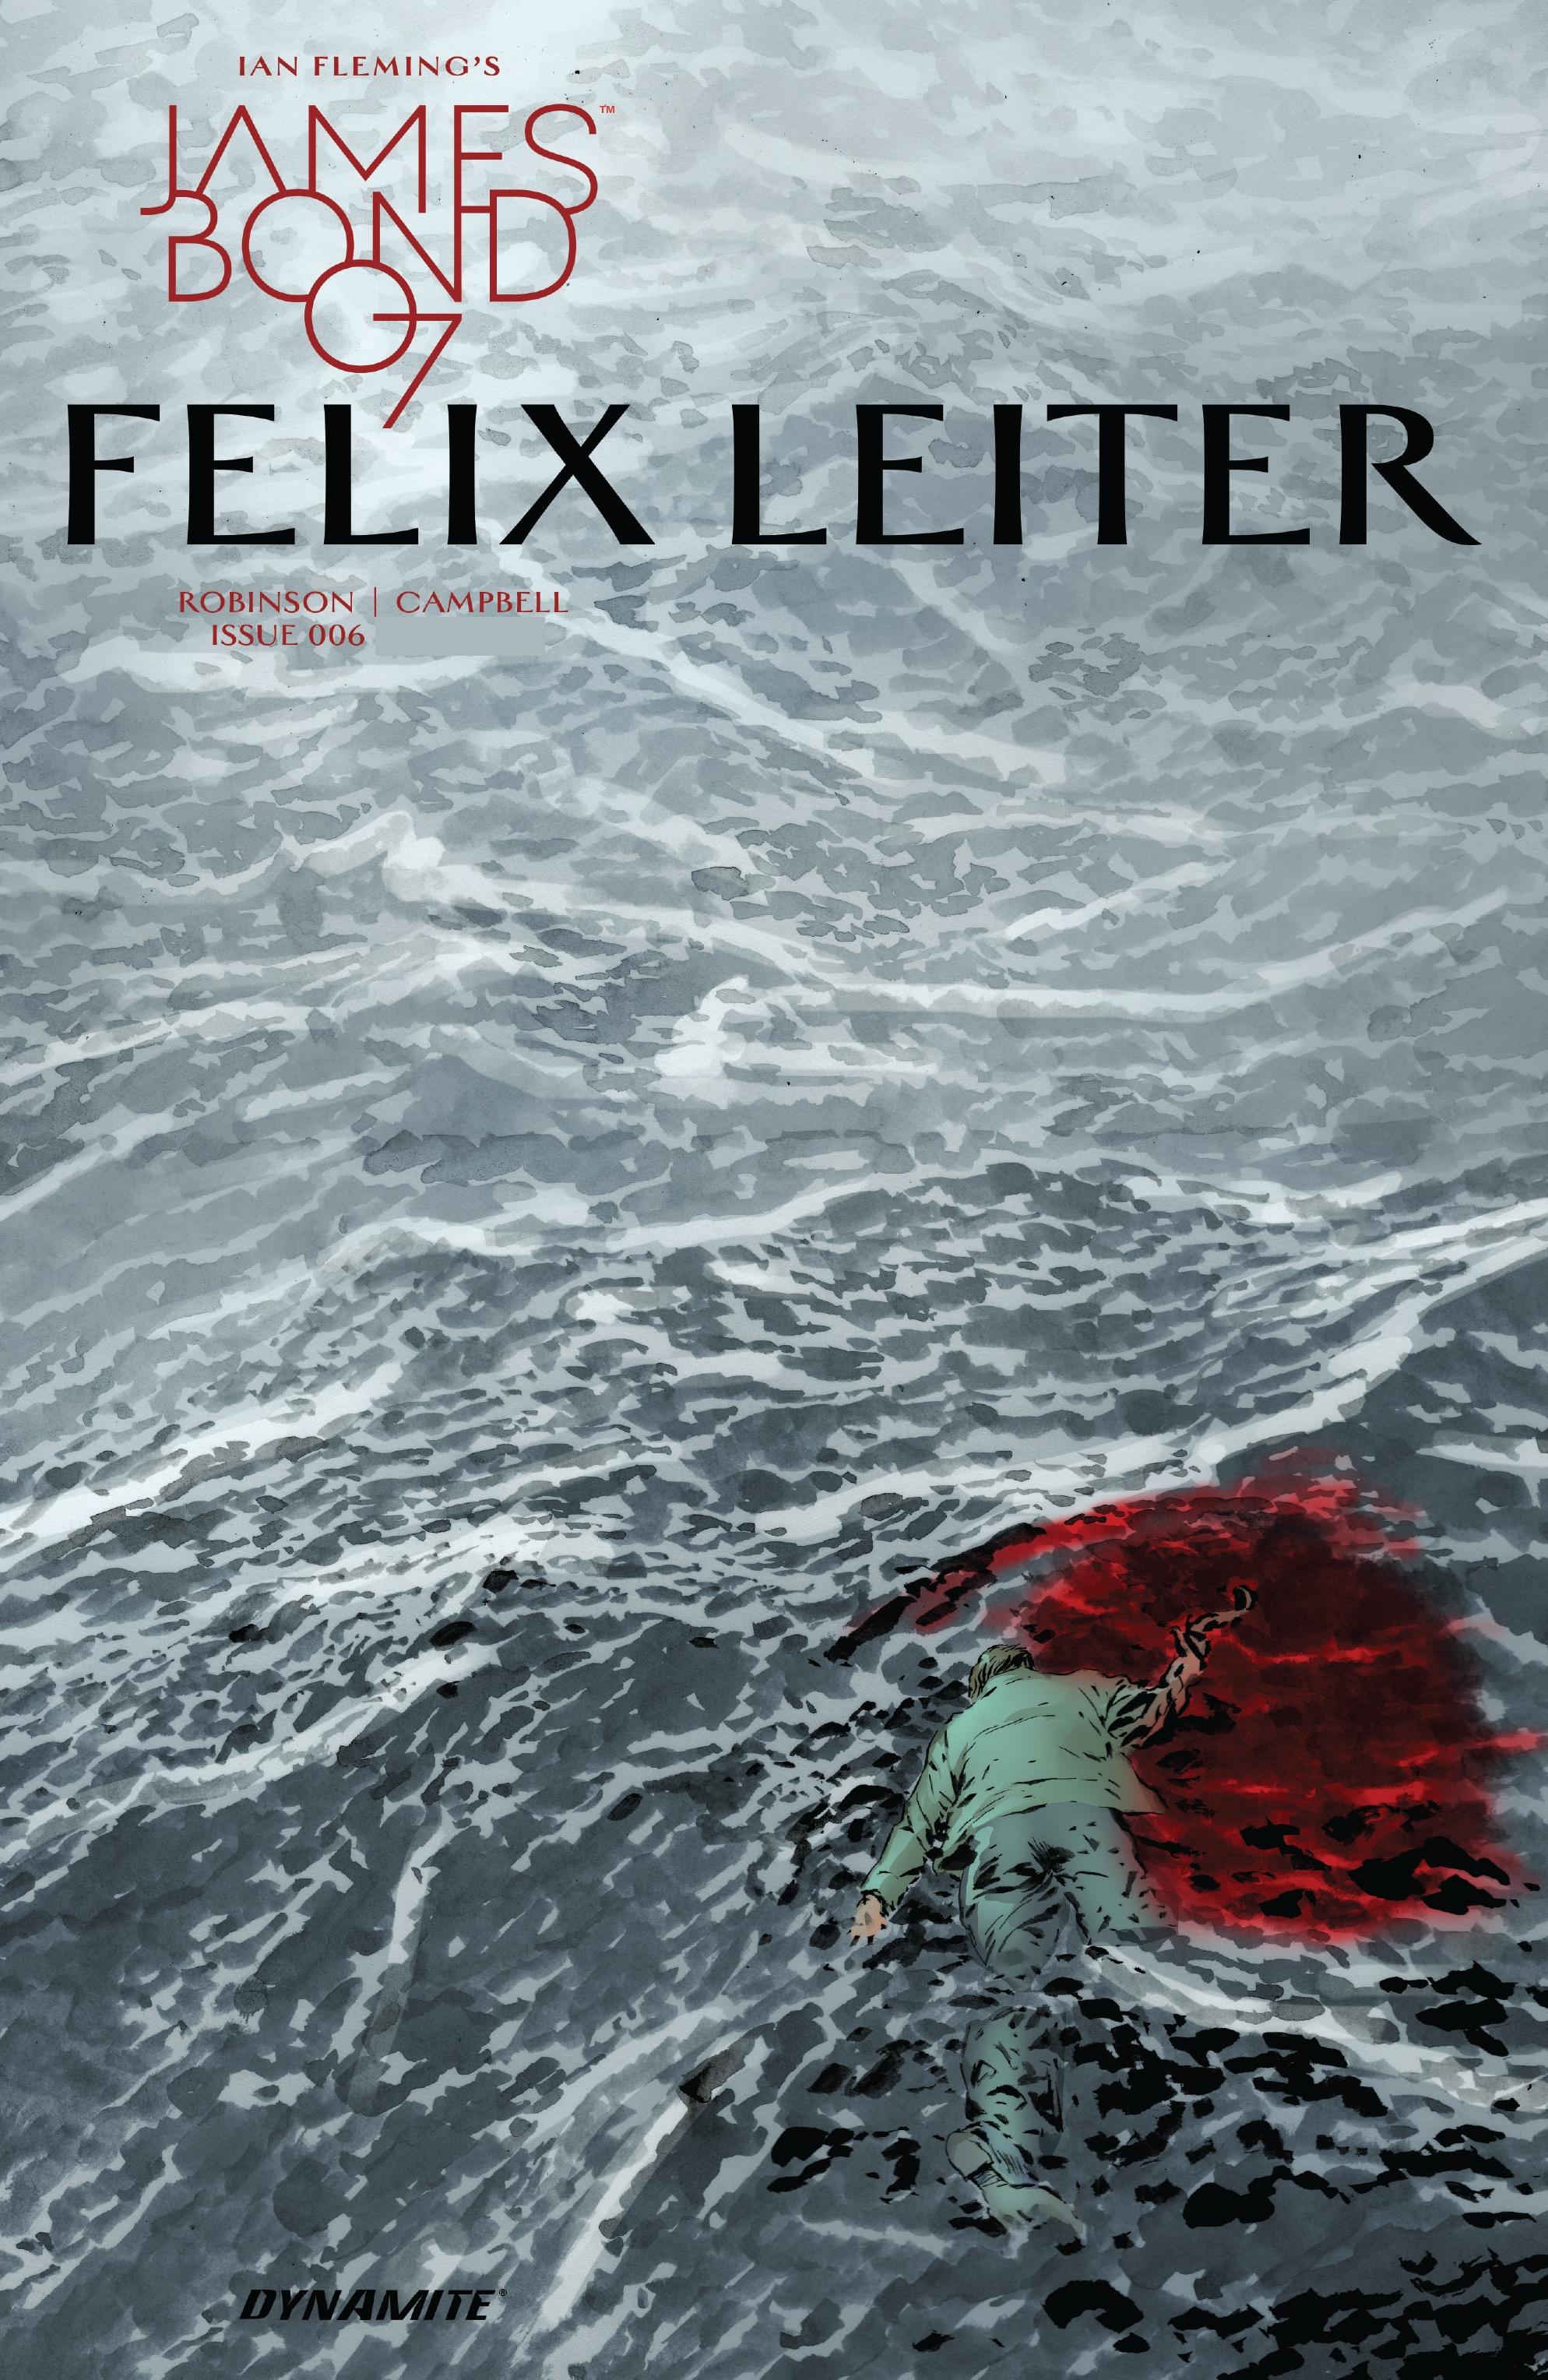 Read online James Bond: Felix Leiter comic -  Issue #6 - 1